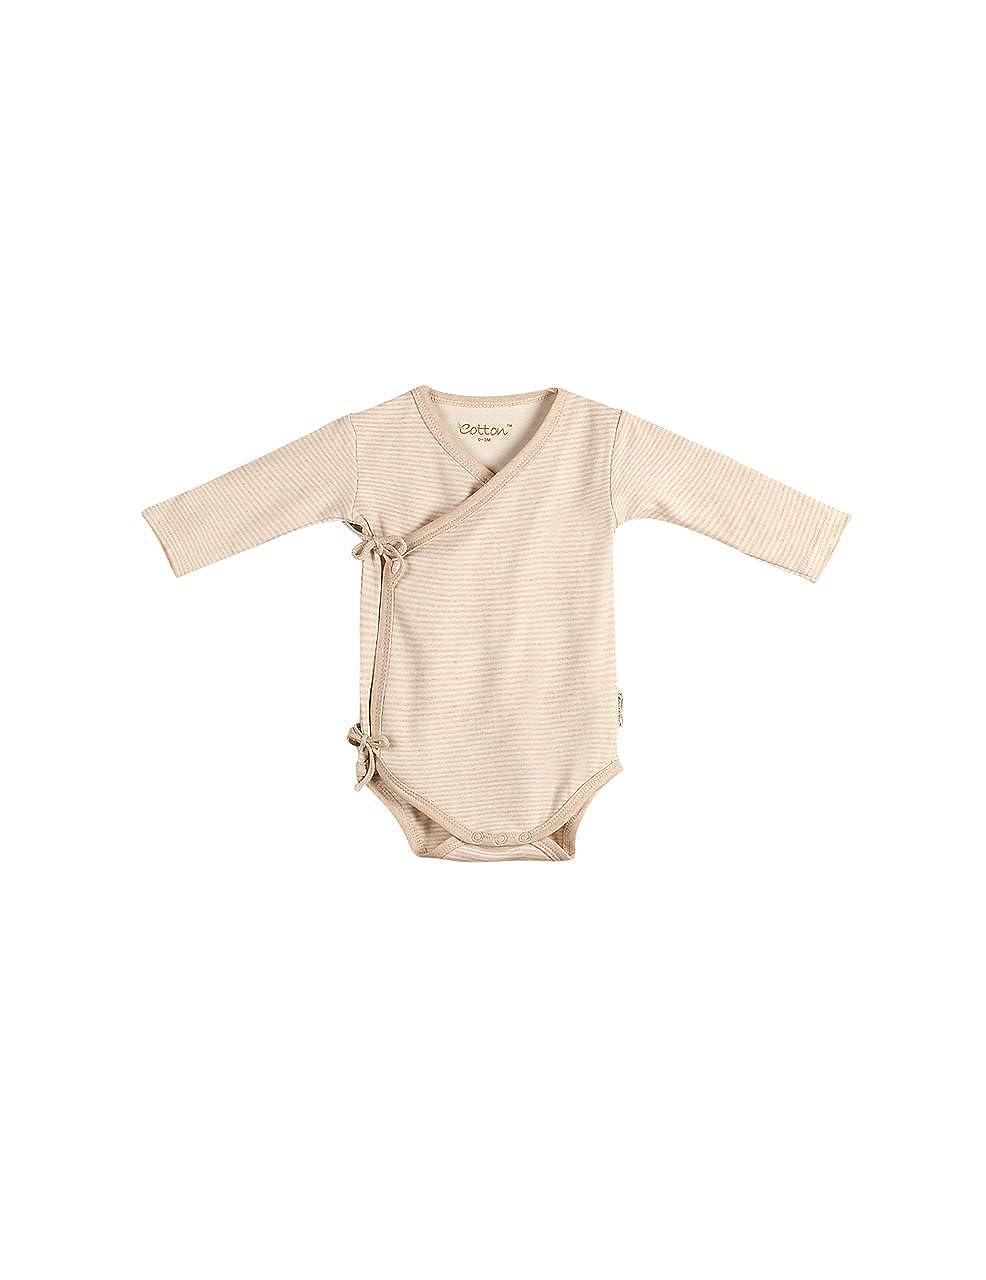 60b0919fe Amazon.com  Eotton Certified Organic Cotton Baby Pullover Bodysuit ...